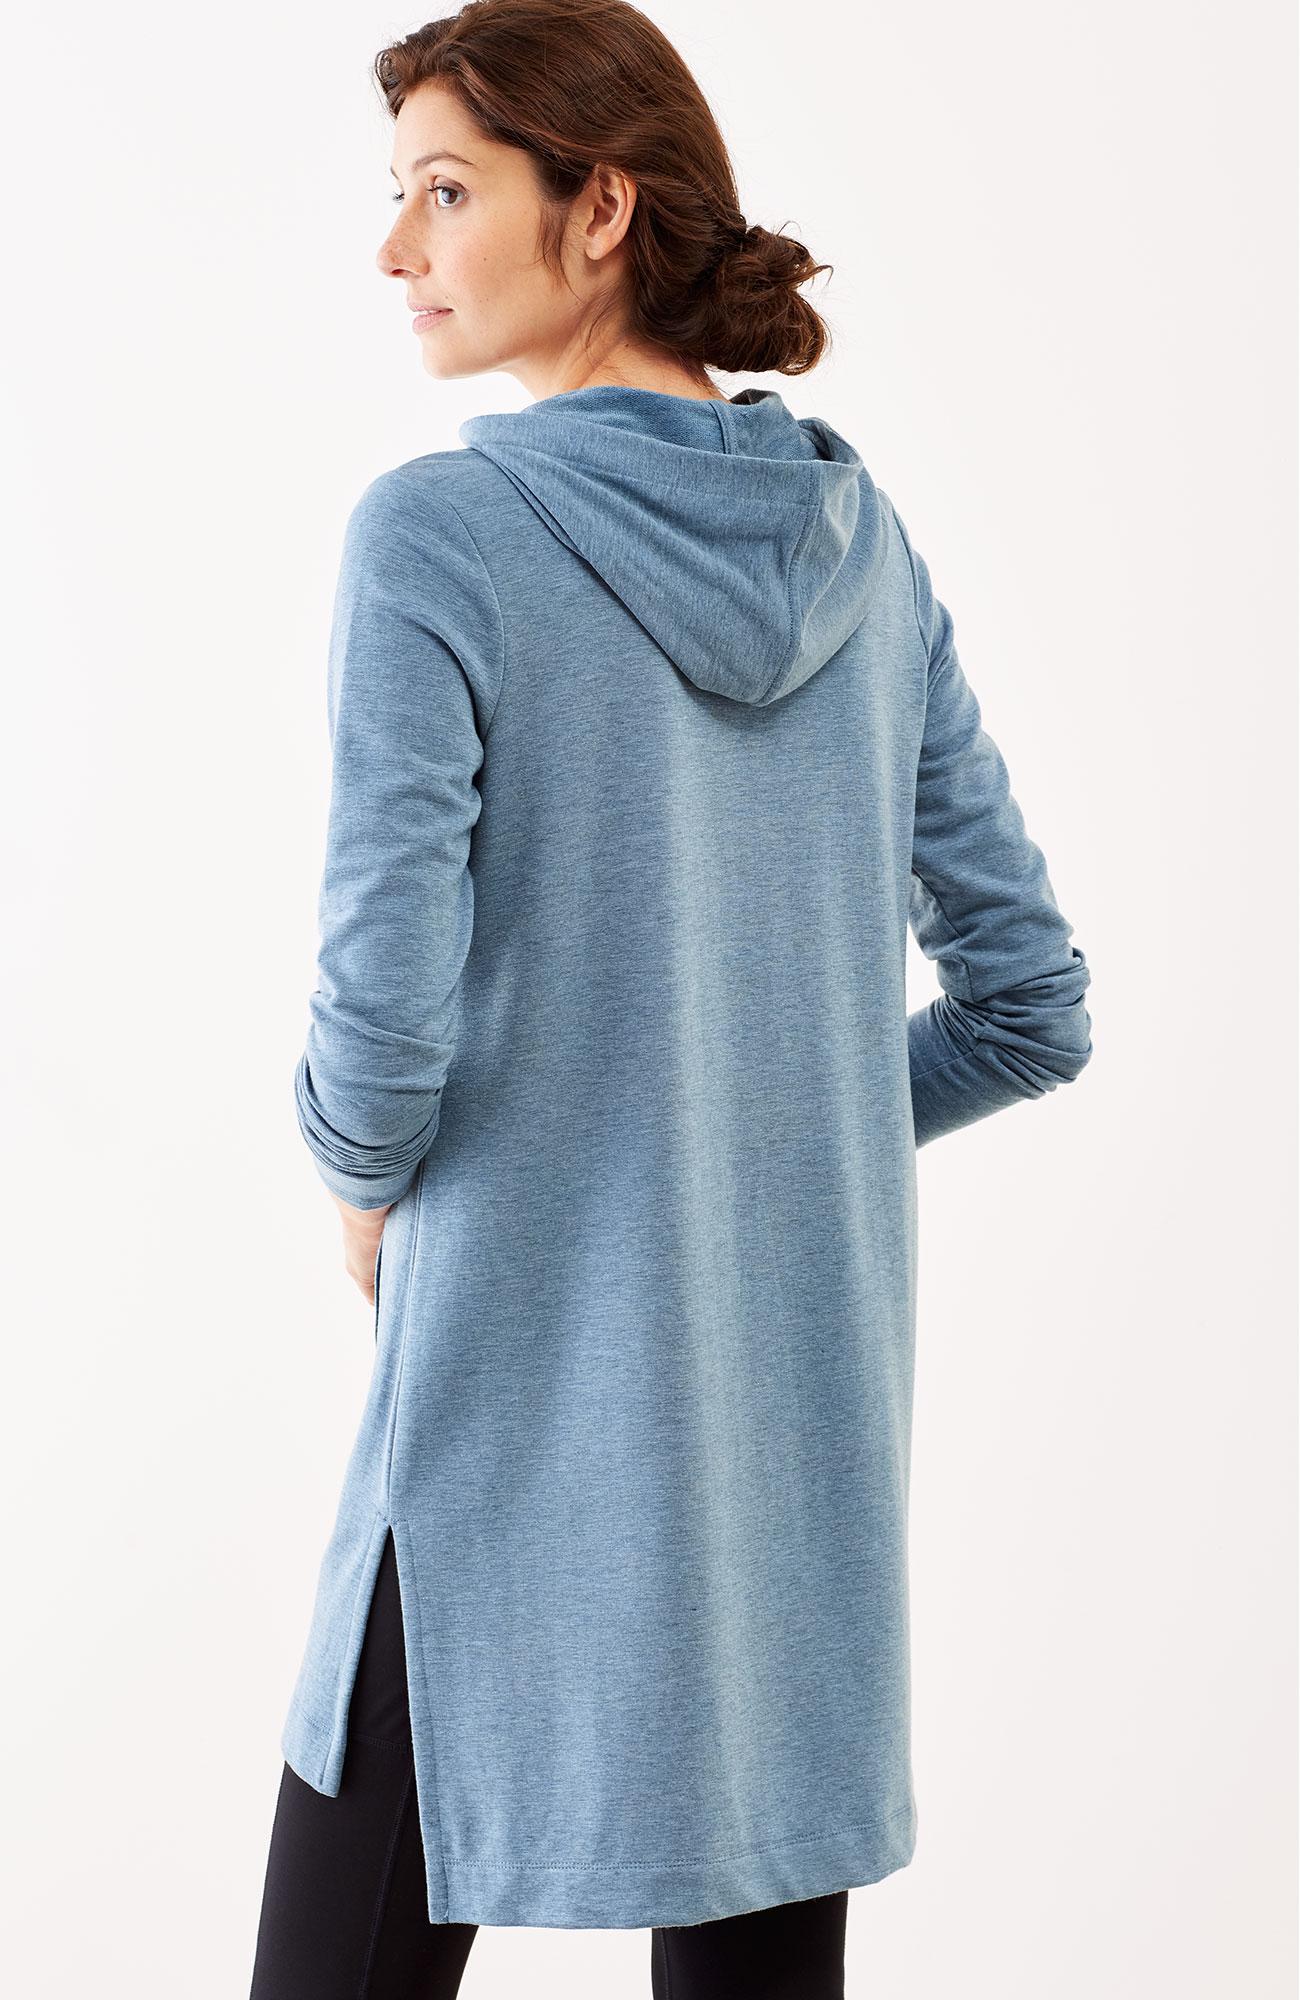 Pure Jill Luxe Tencel® hooded tunic